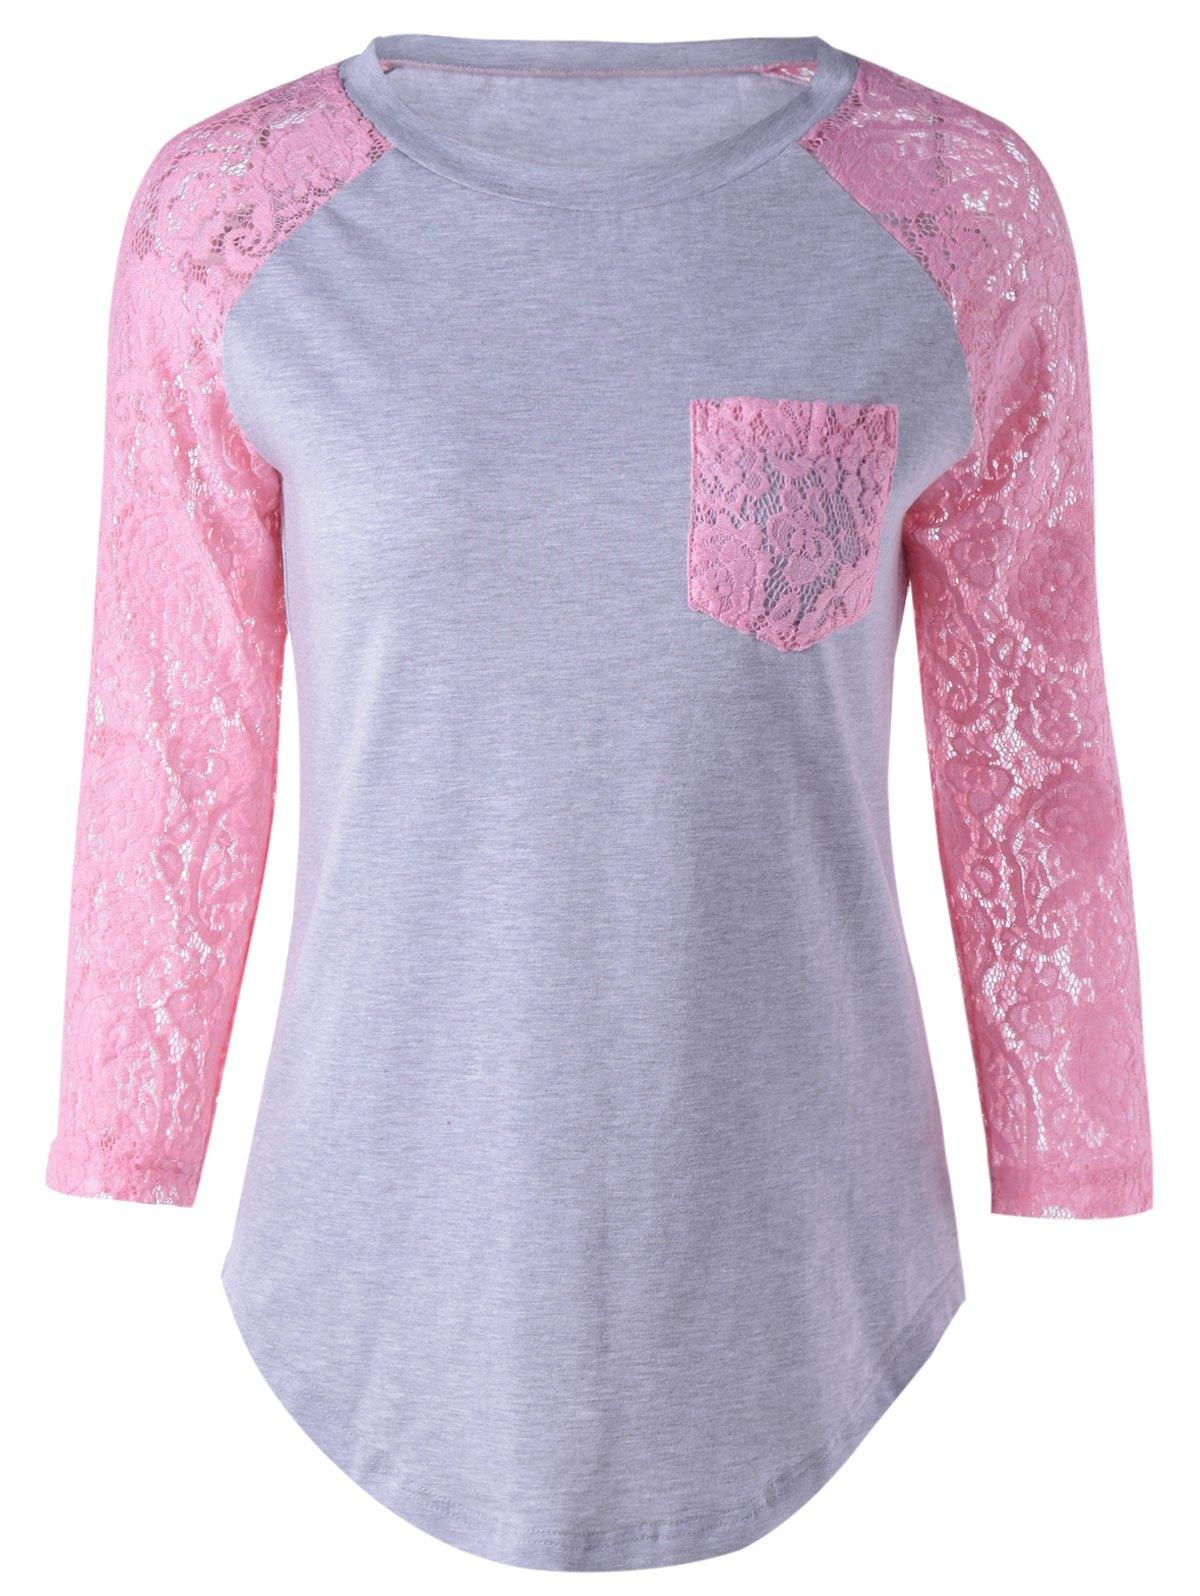 Lace Patchwork Single Pocket T-Shirt